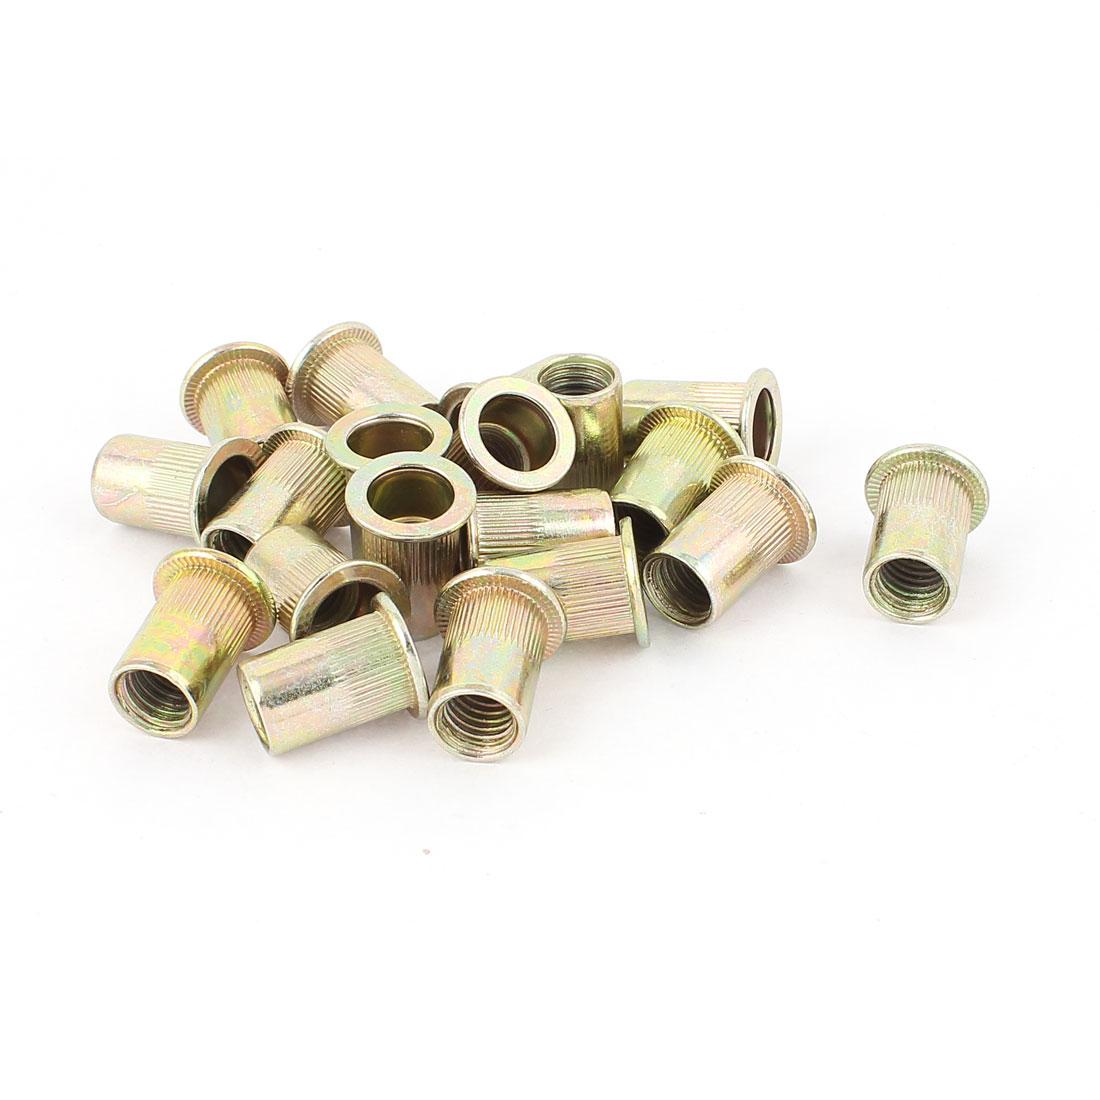 10mm Thread Dia 21mm Long Metal Rivet Nut Insert Nutsert Gold Tone 20Pcs